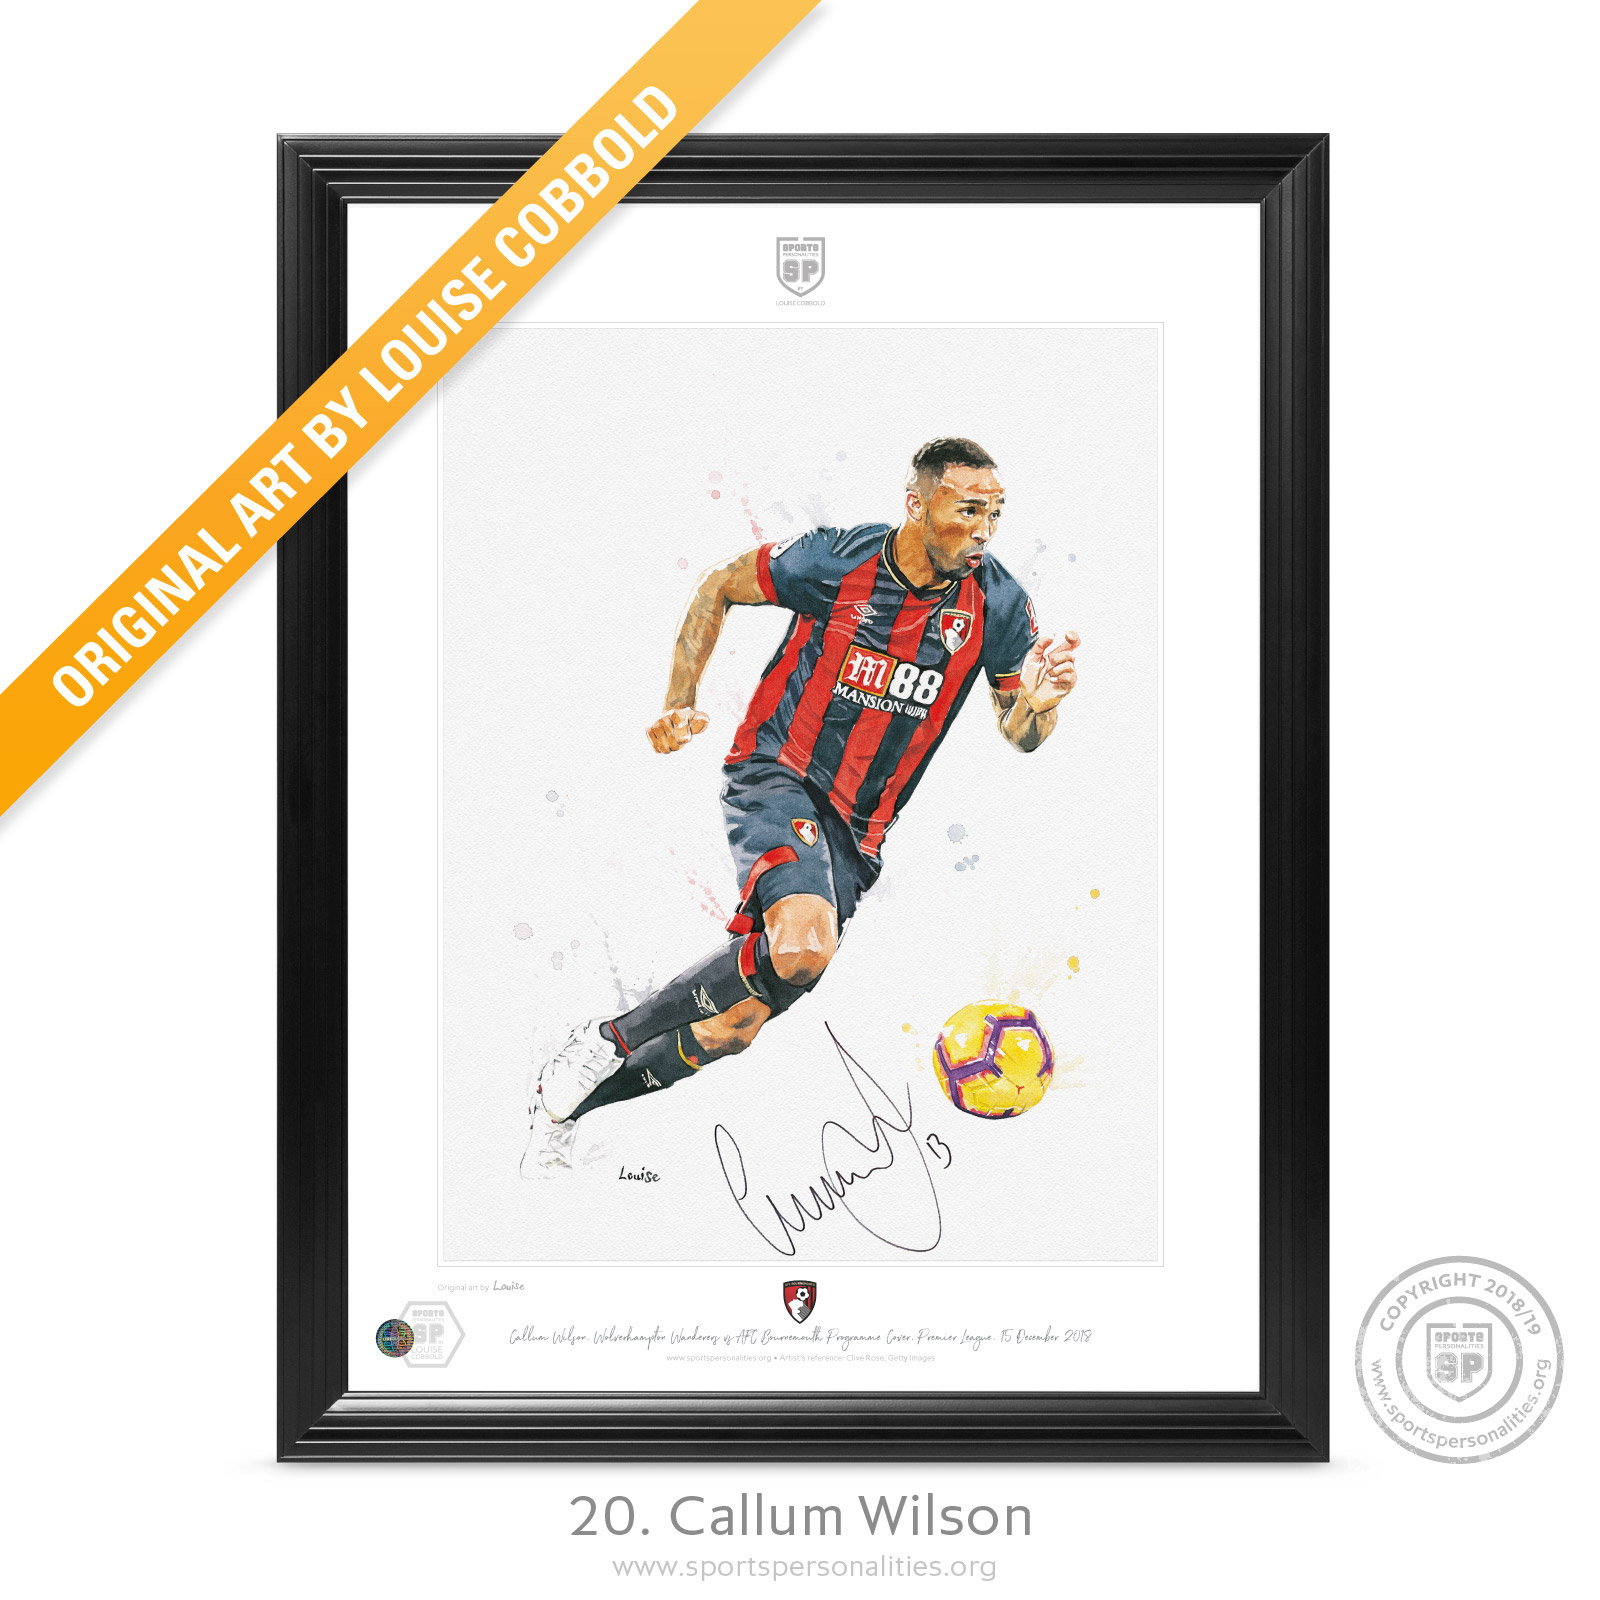 20.-Callum-Wilson.jpg